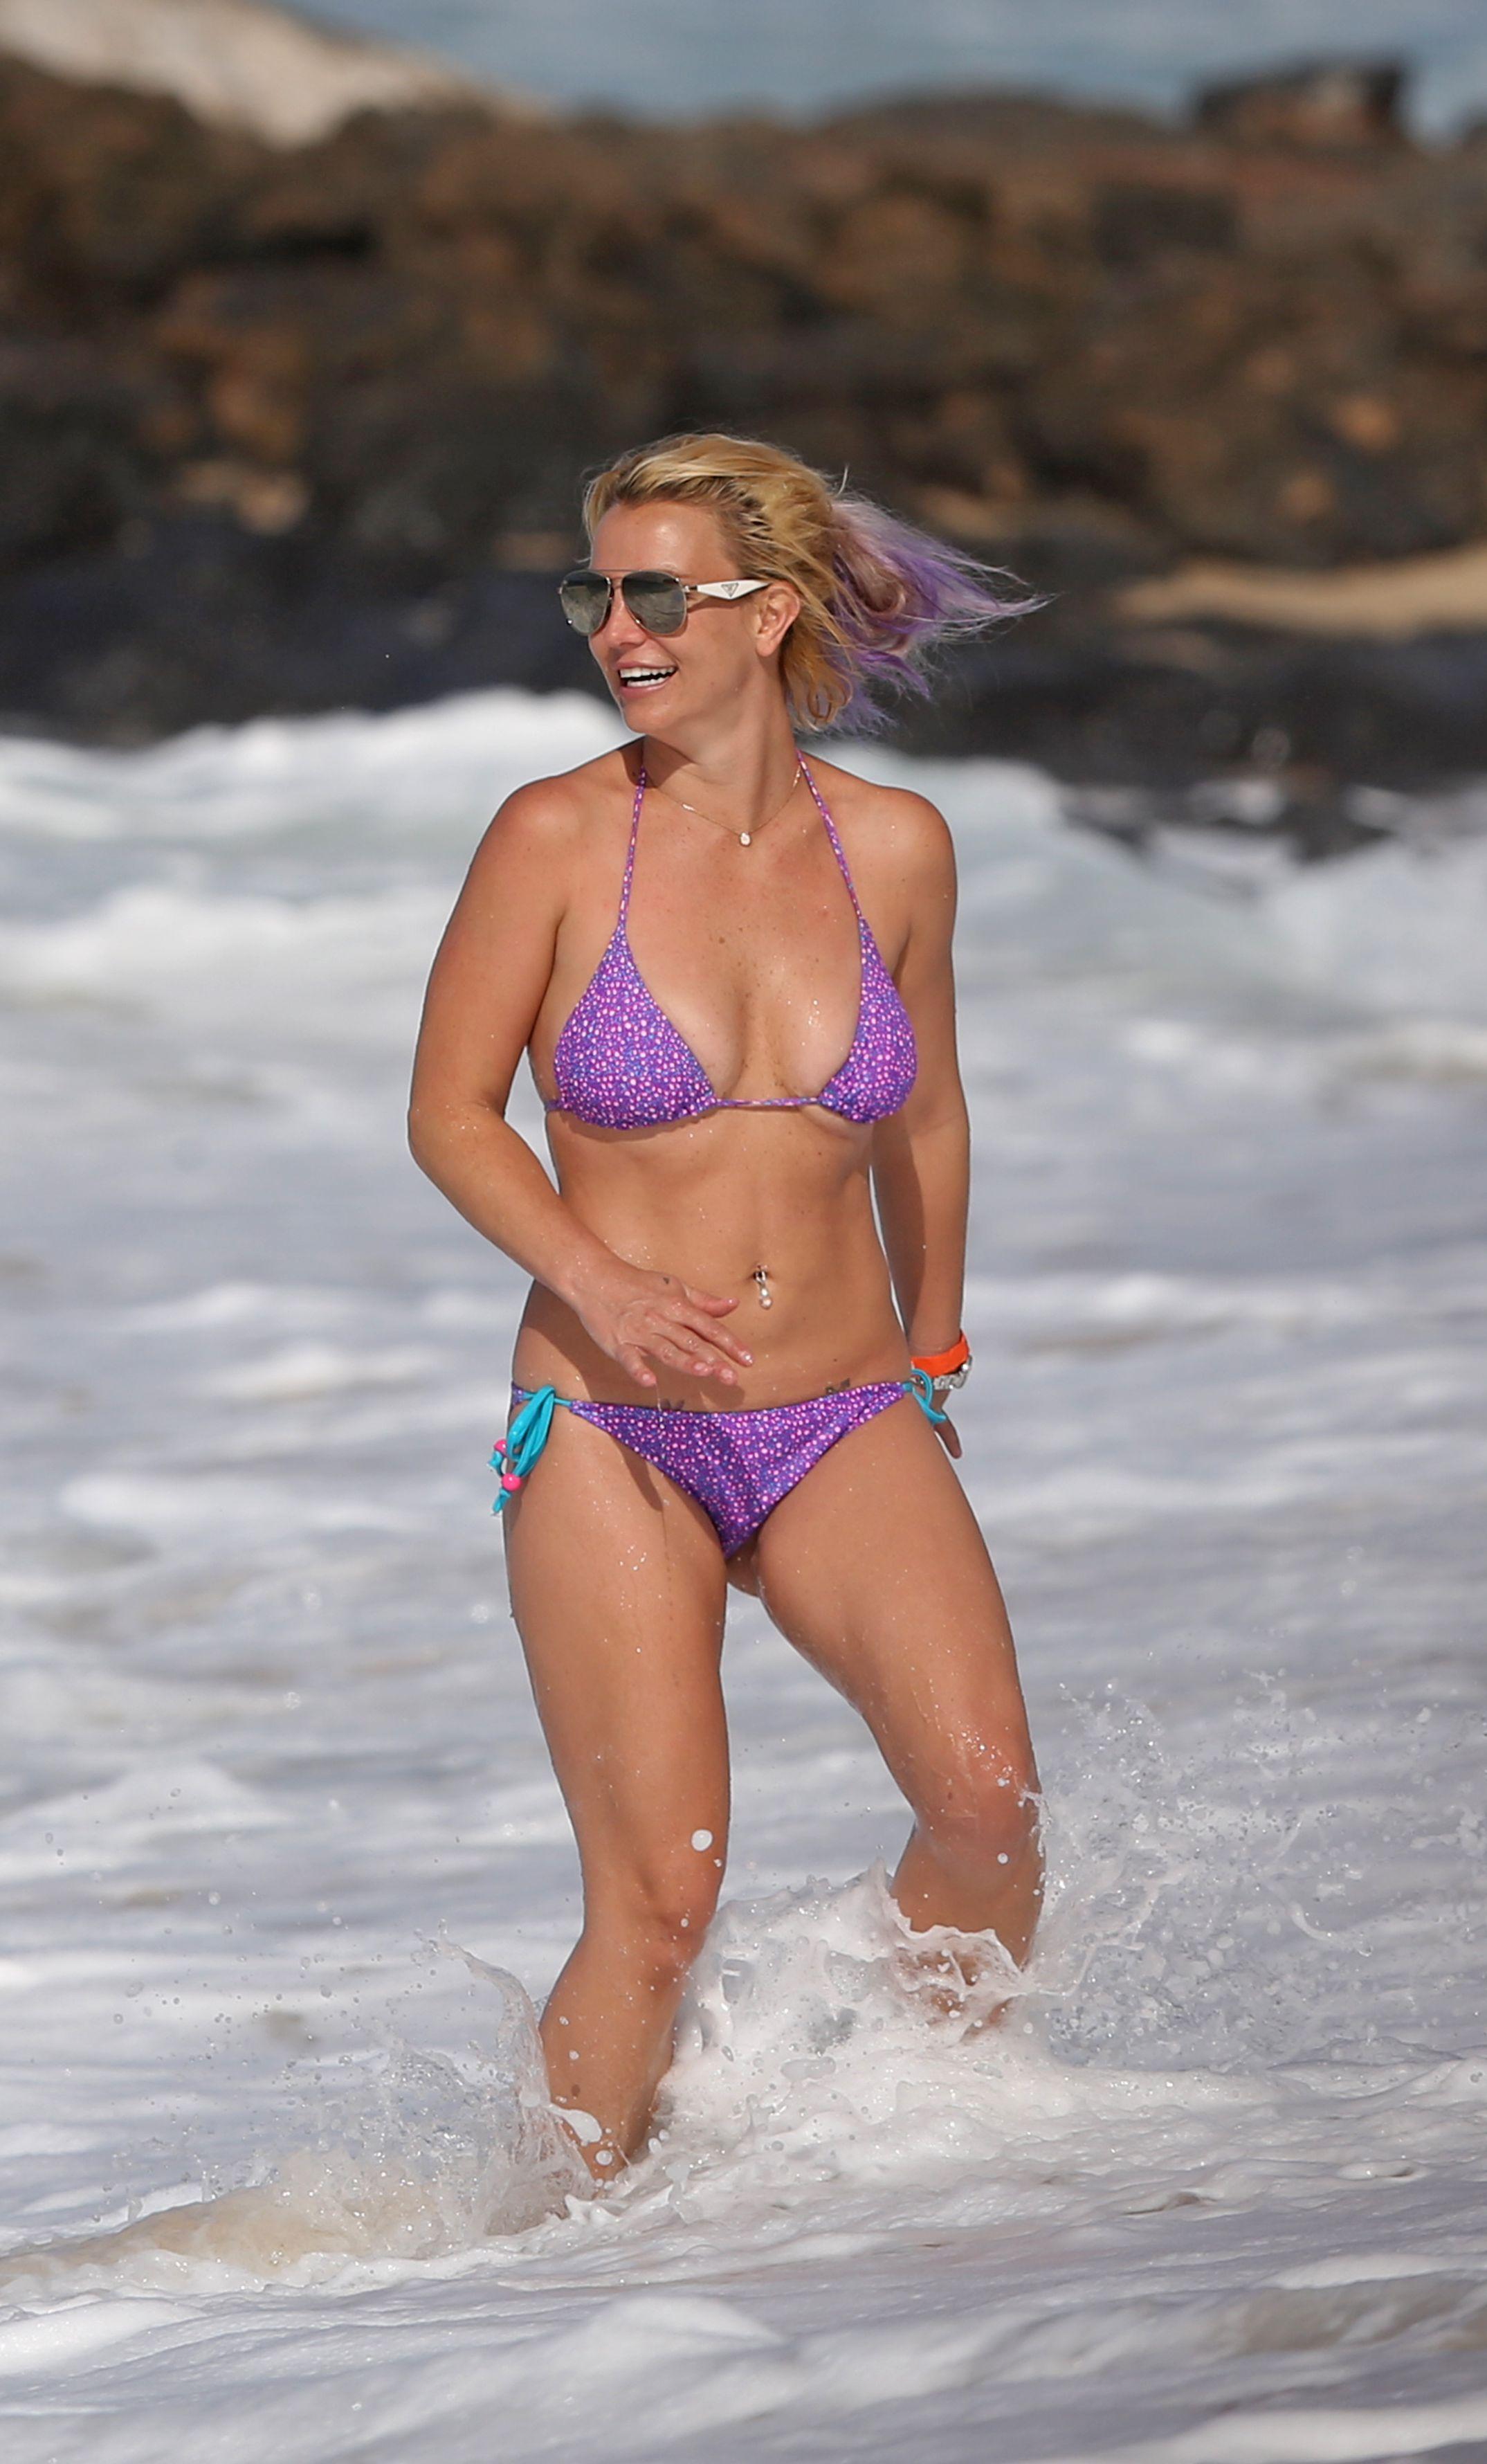 Britney spears 2017 bikini